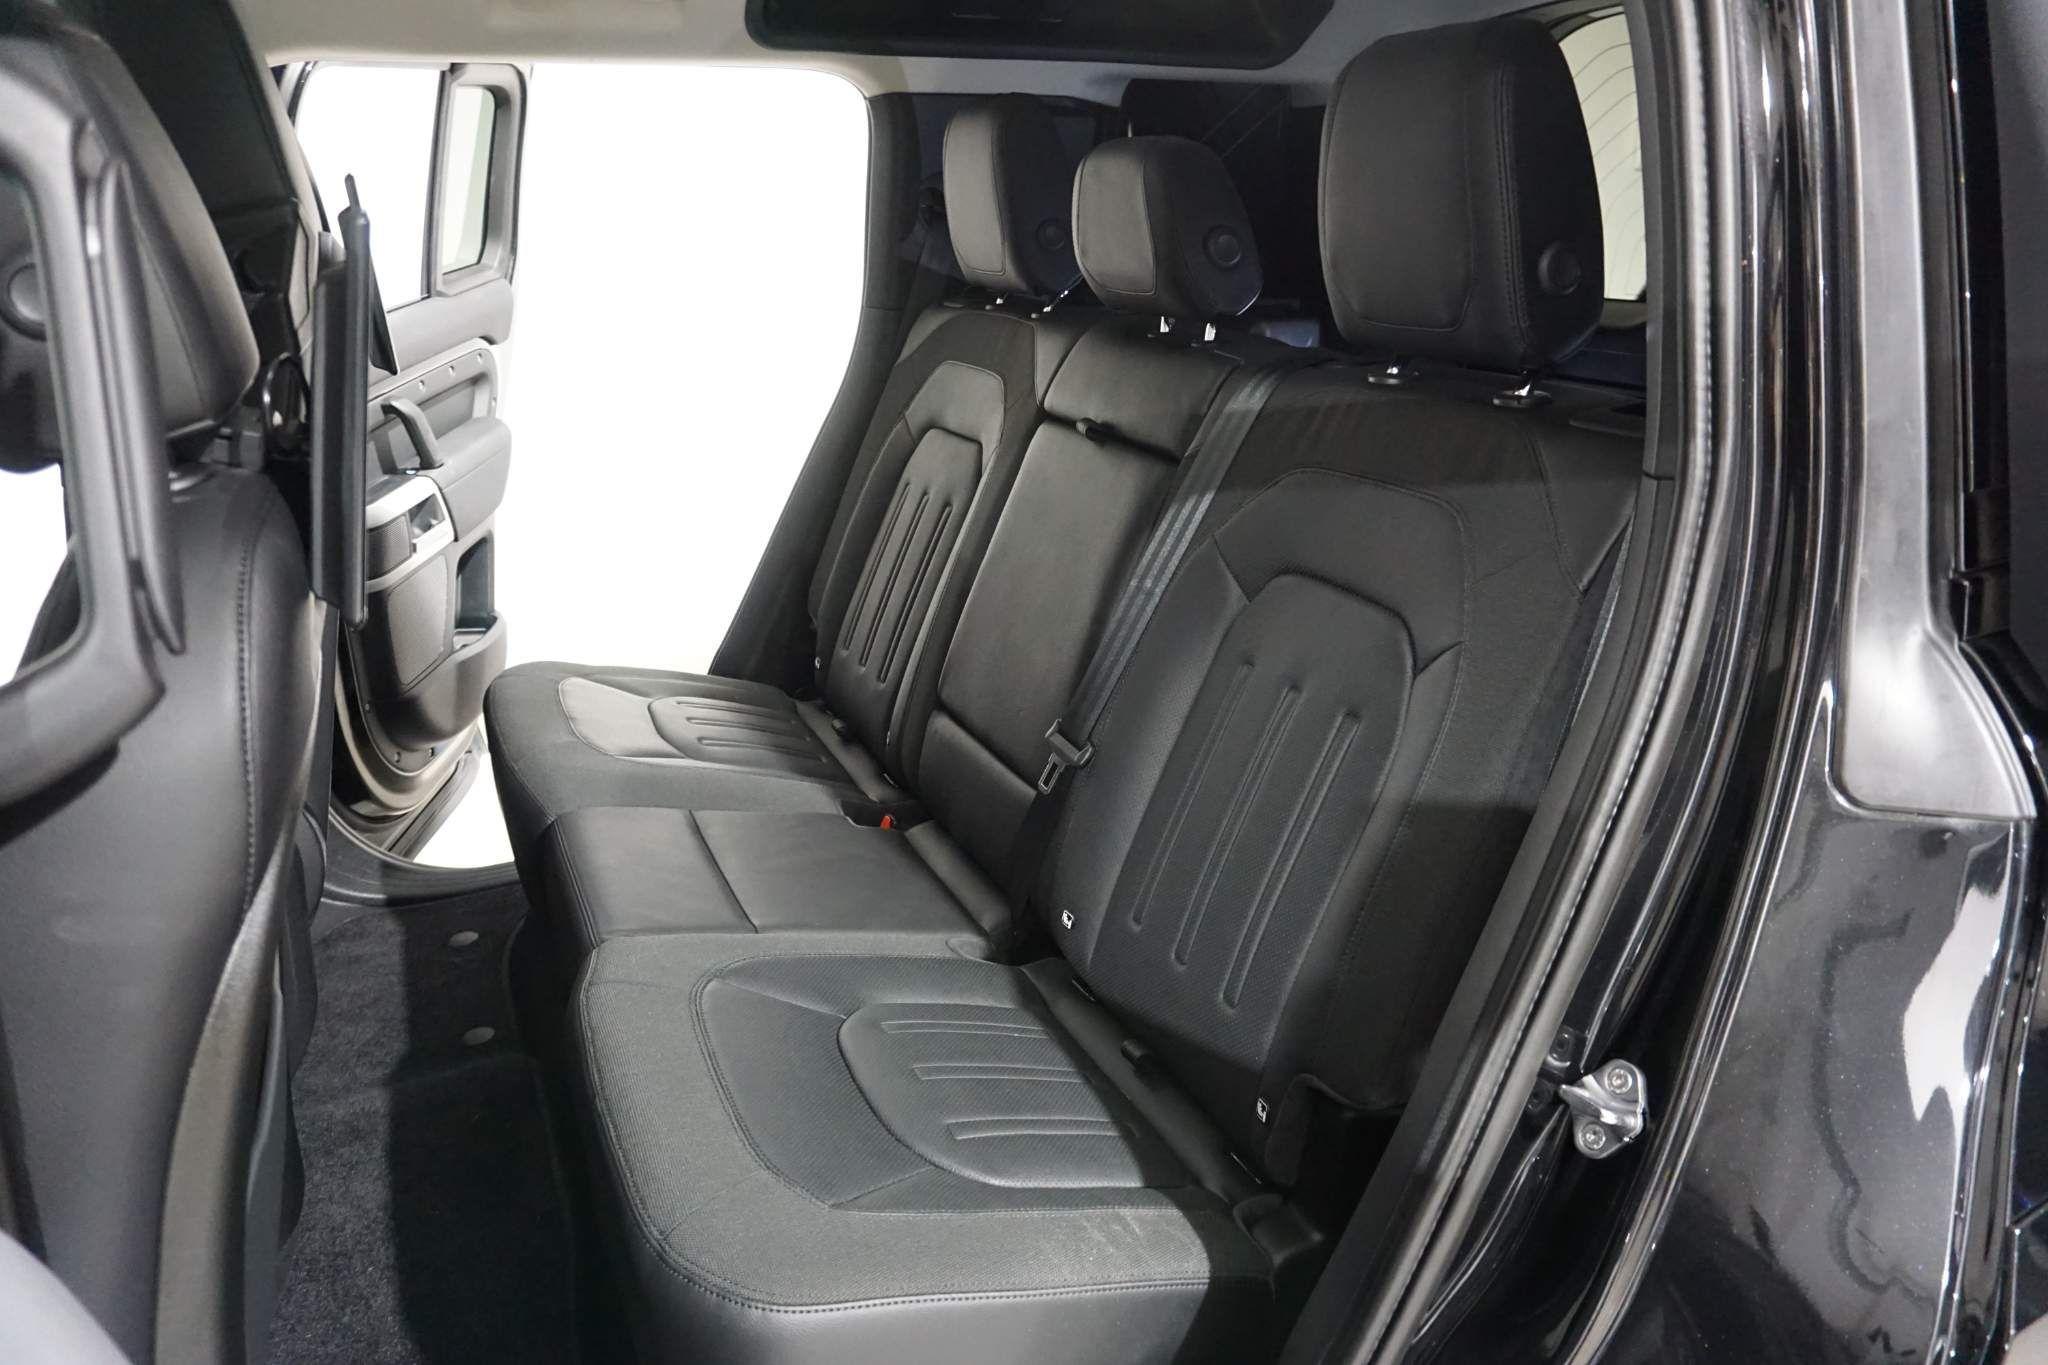 Land Rover Defender 110 2.0 SD4 SE Auto 4WD (s/s) 5dr